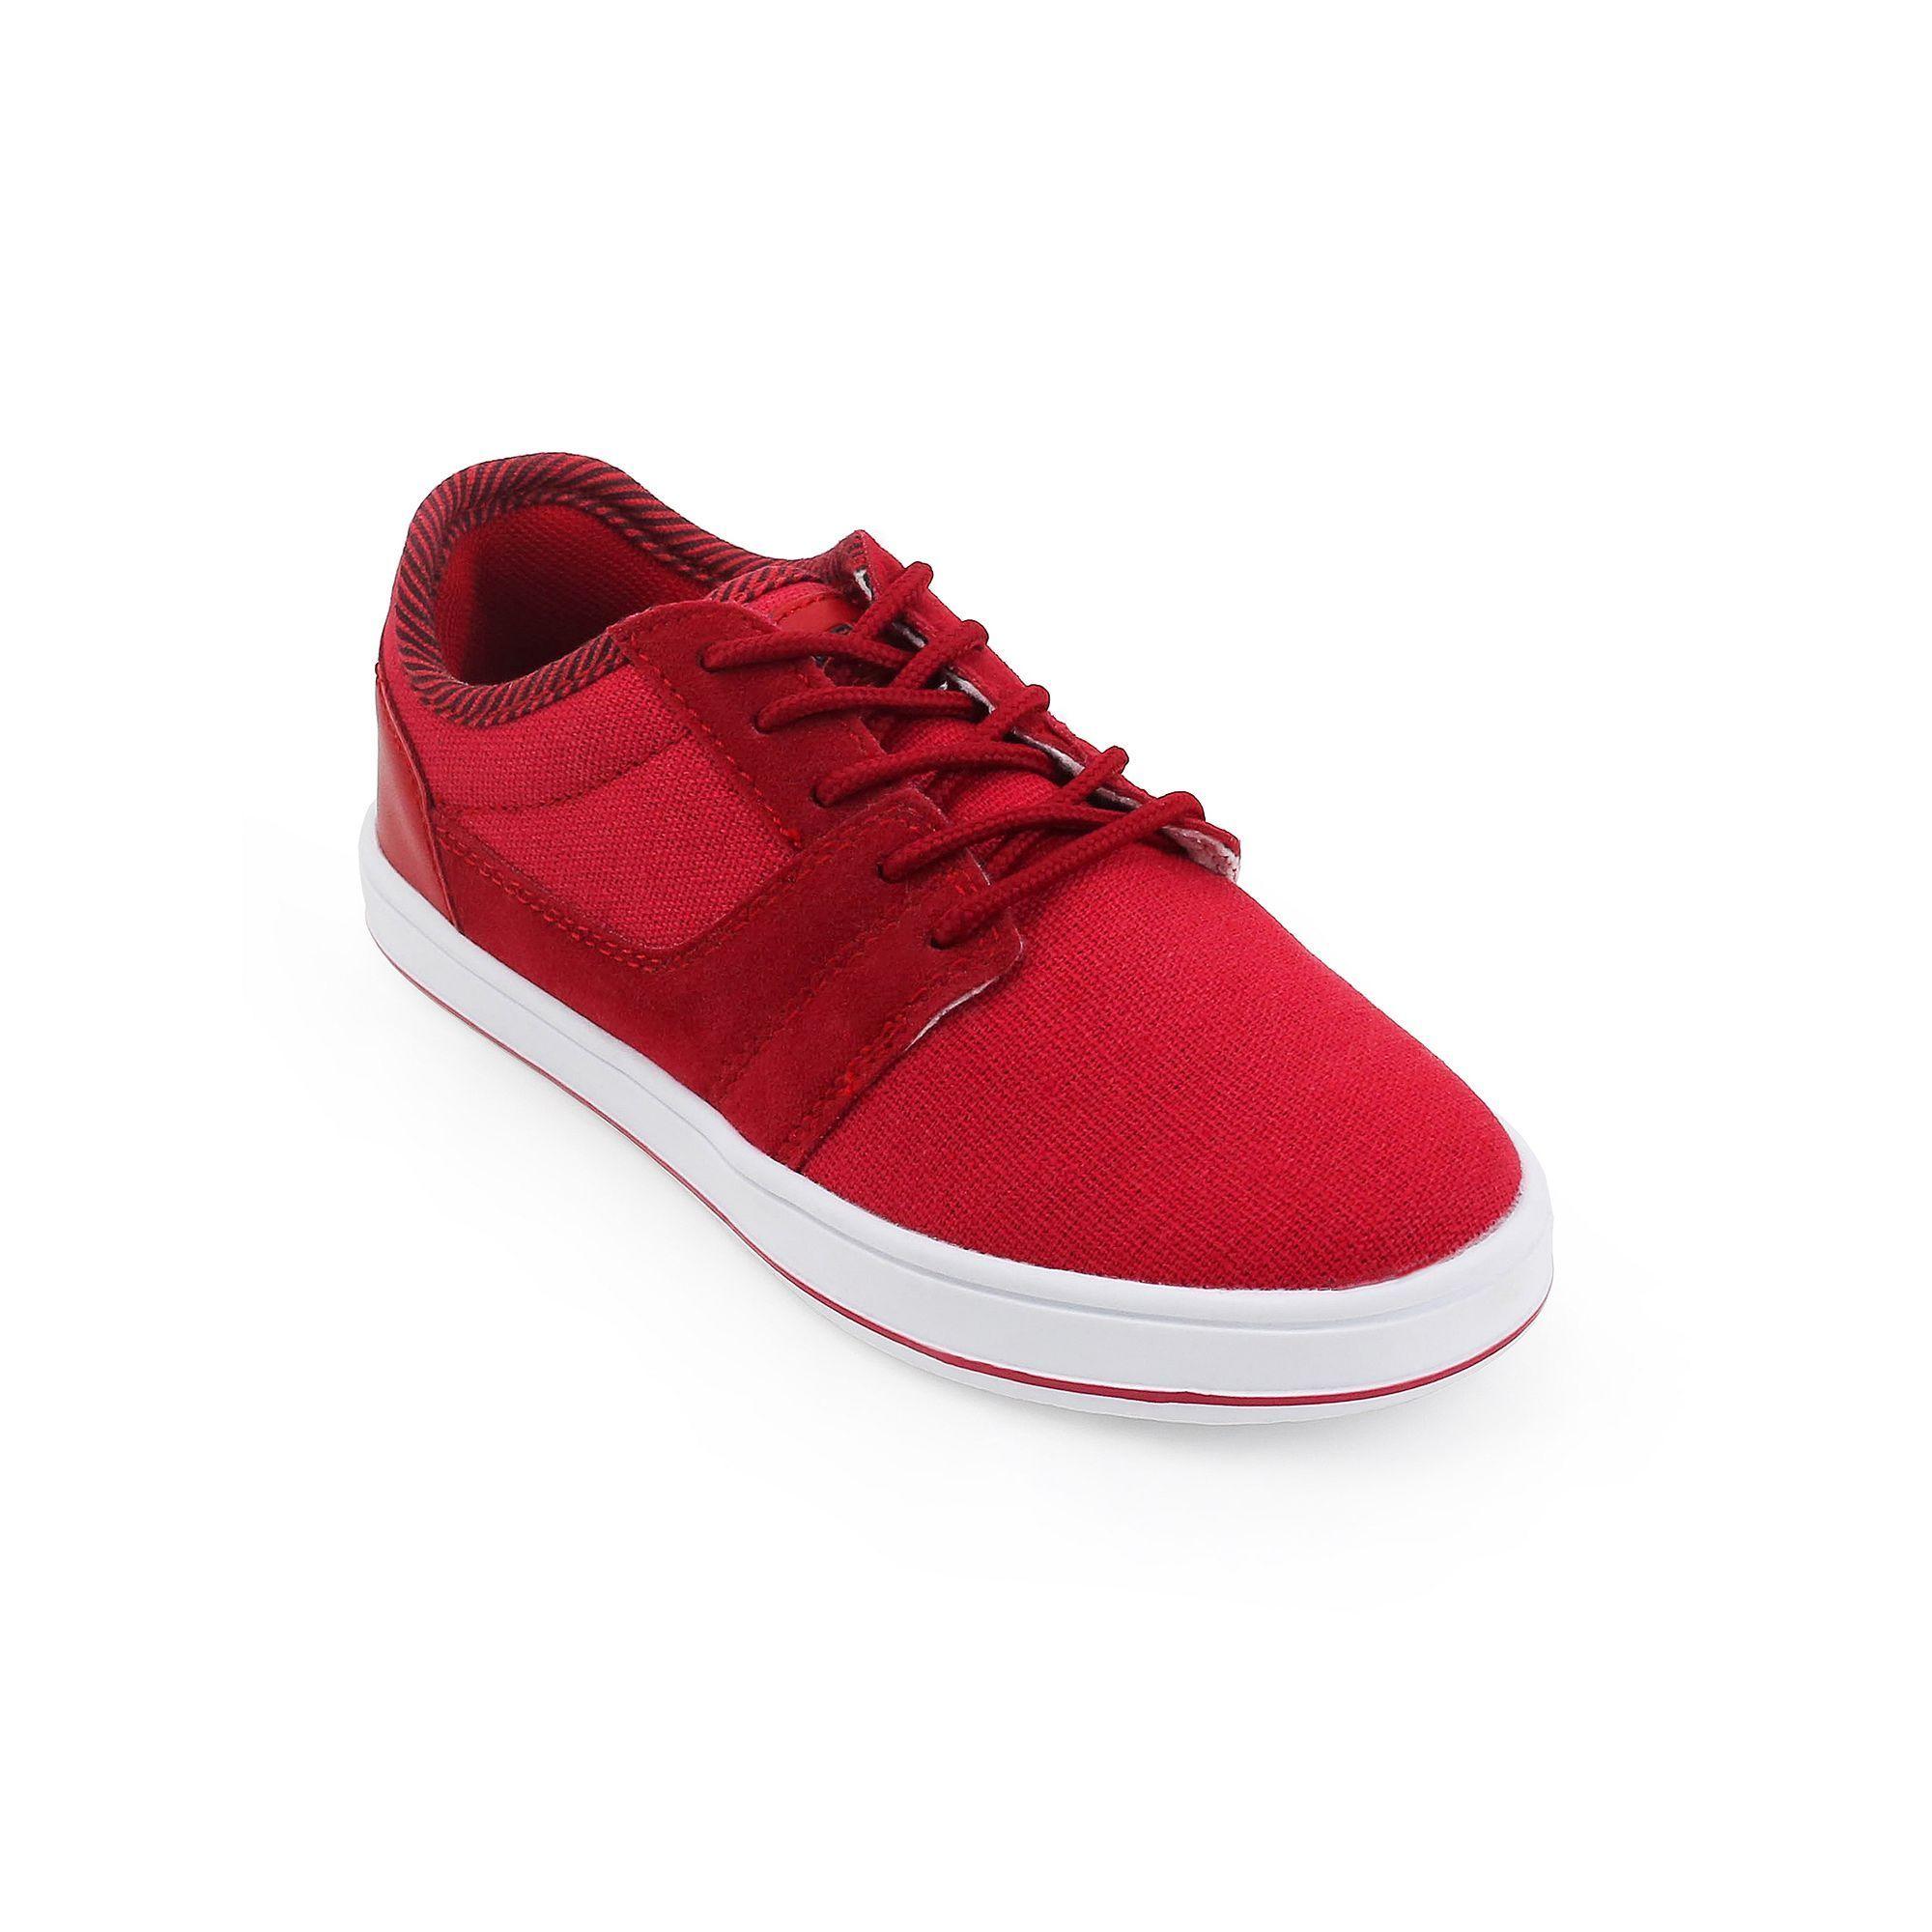 Unionbay Anson Boys  Sneakers 693cdce8c